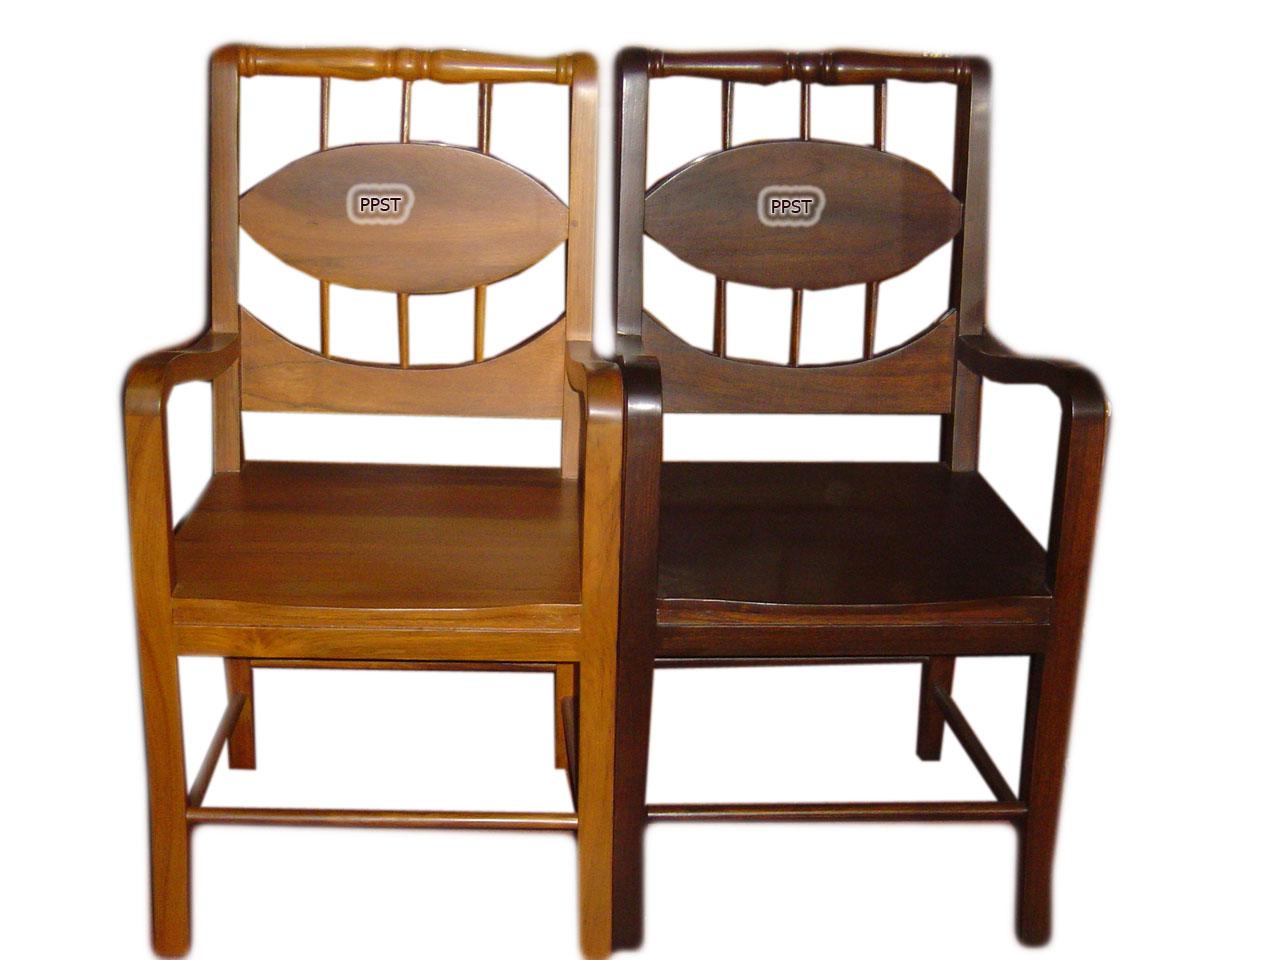 Antique Chair-sn002-2